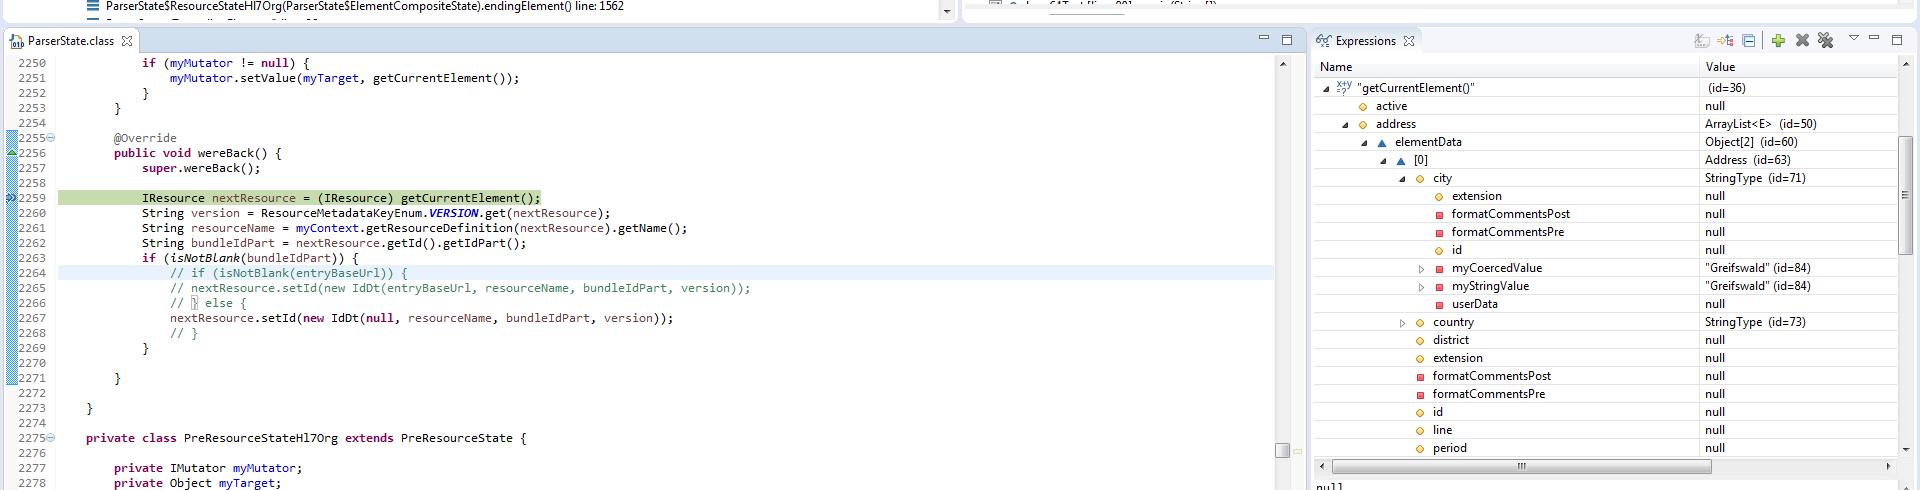 screenshot_debugging_parser class